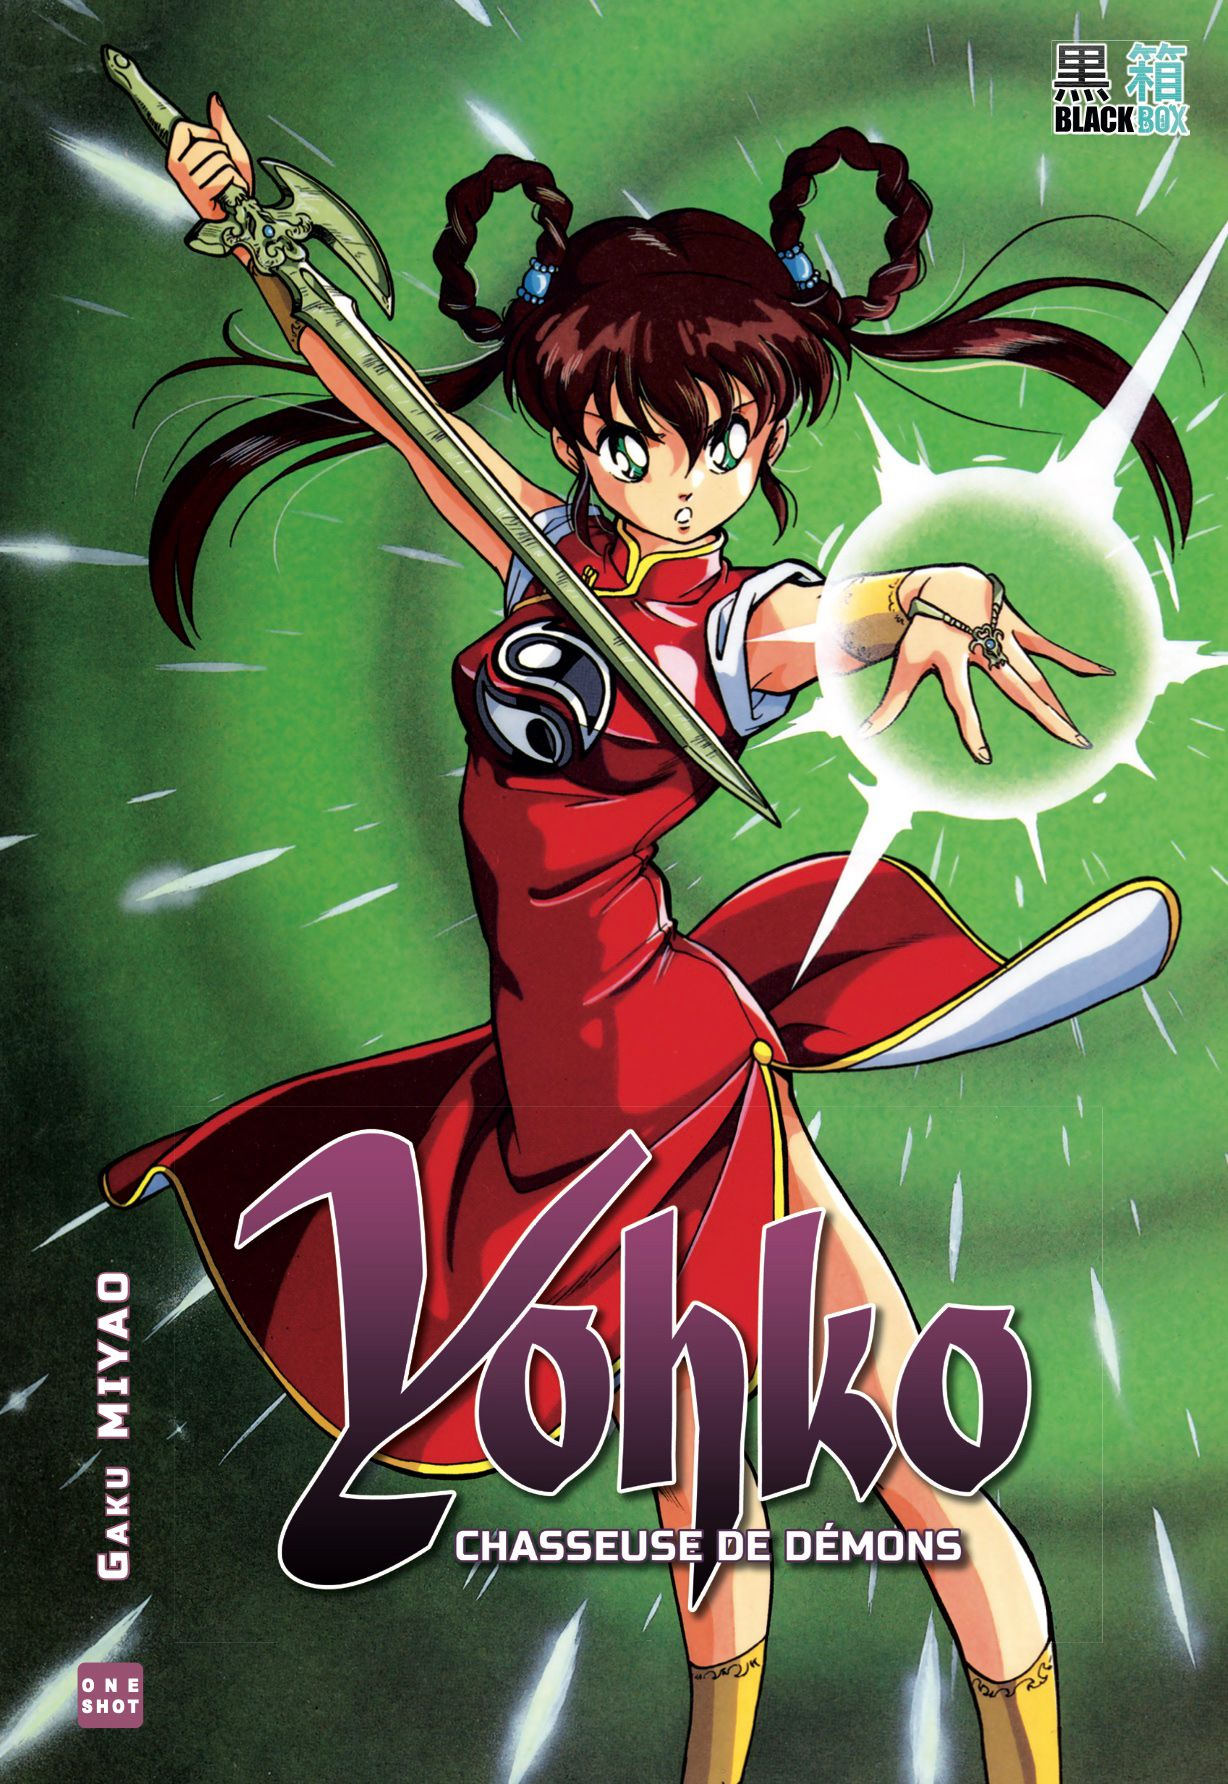 Yohko - Chasseuse de Démons 1